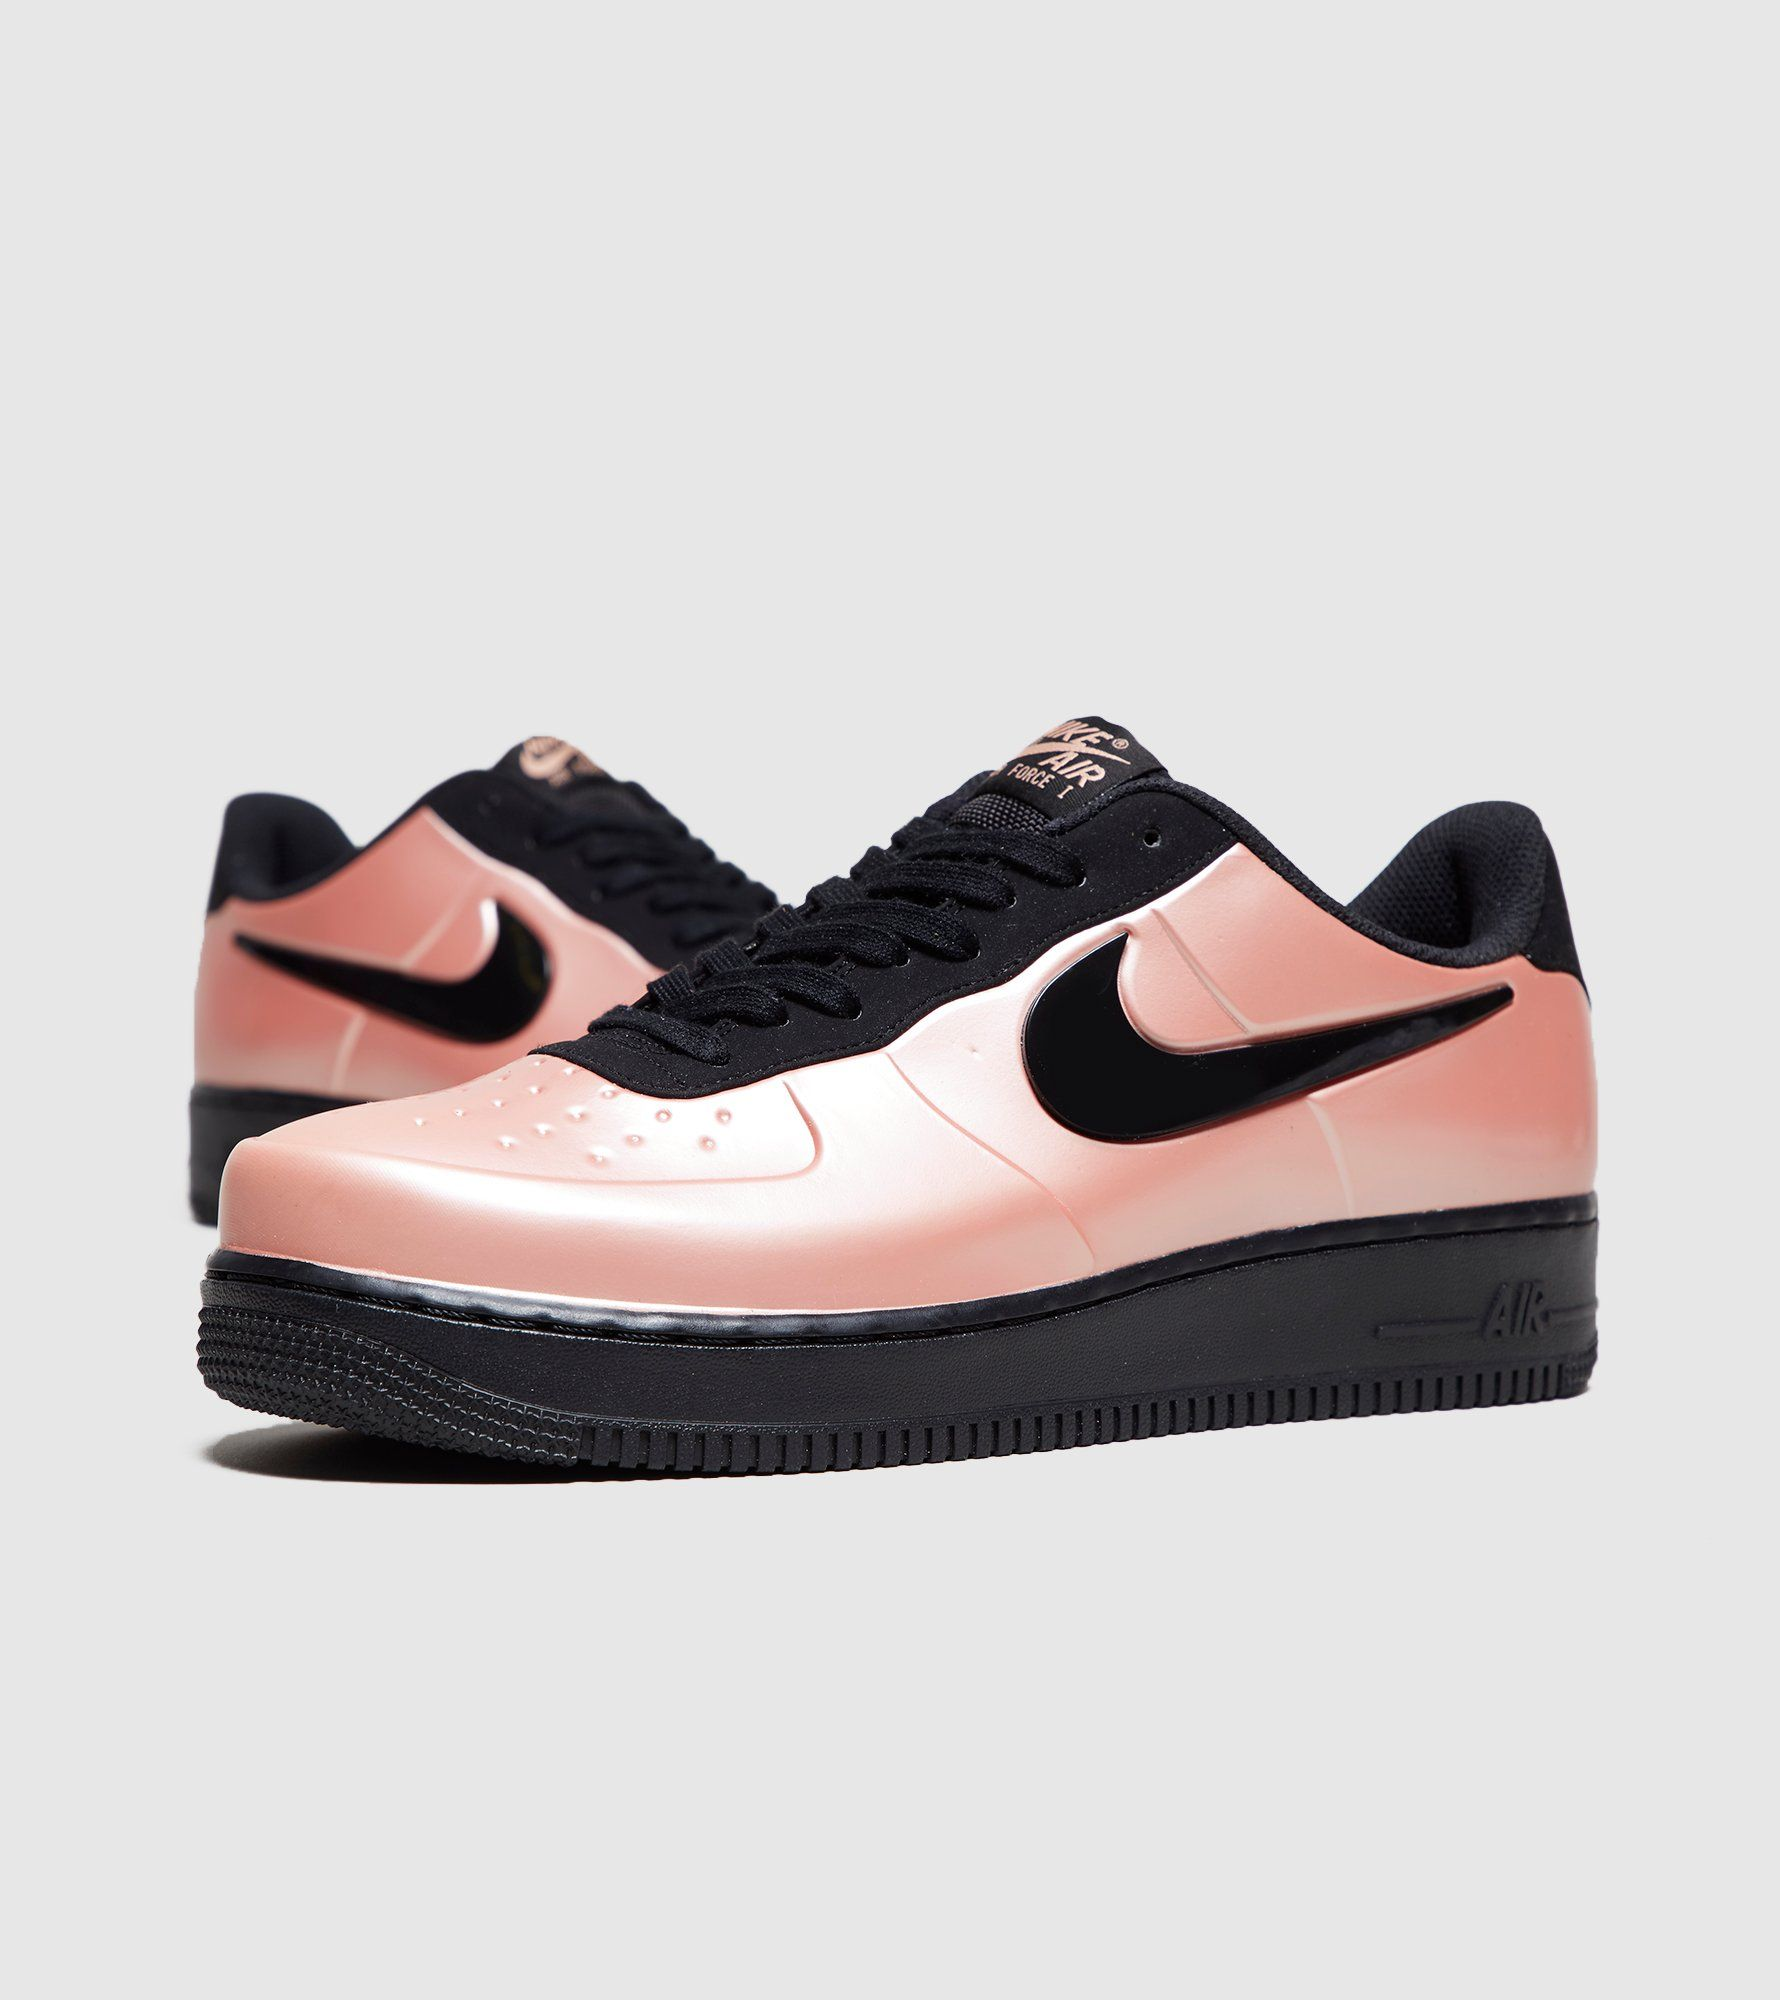 Nike Air Force 1 Foamposite Pro Cupsole